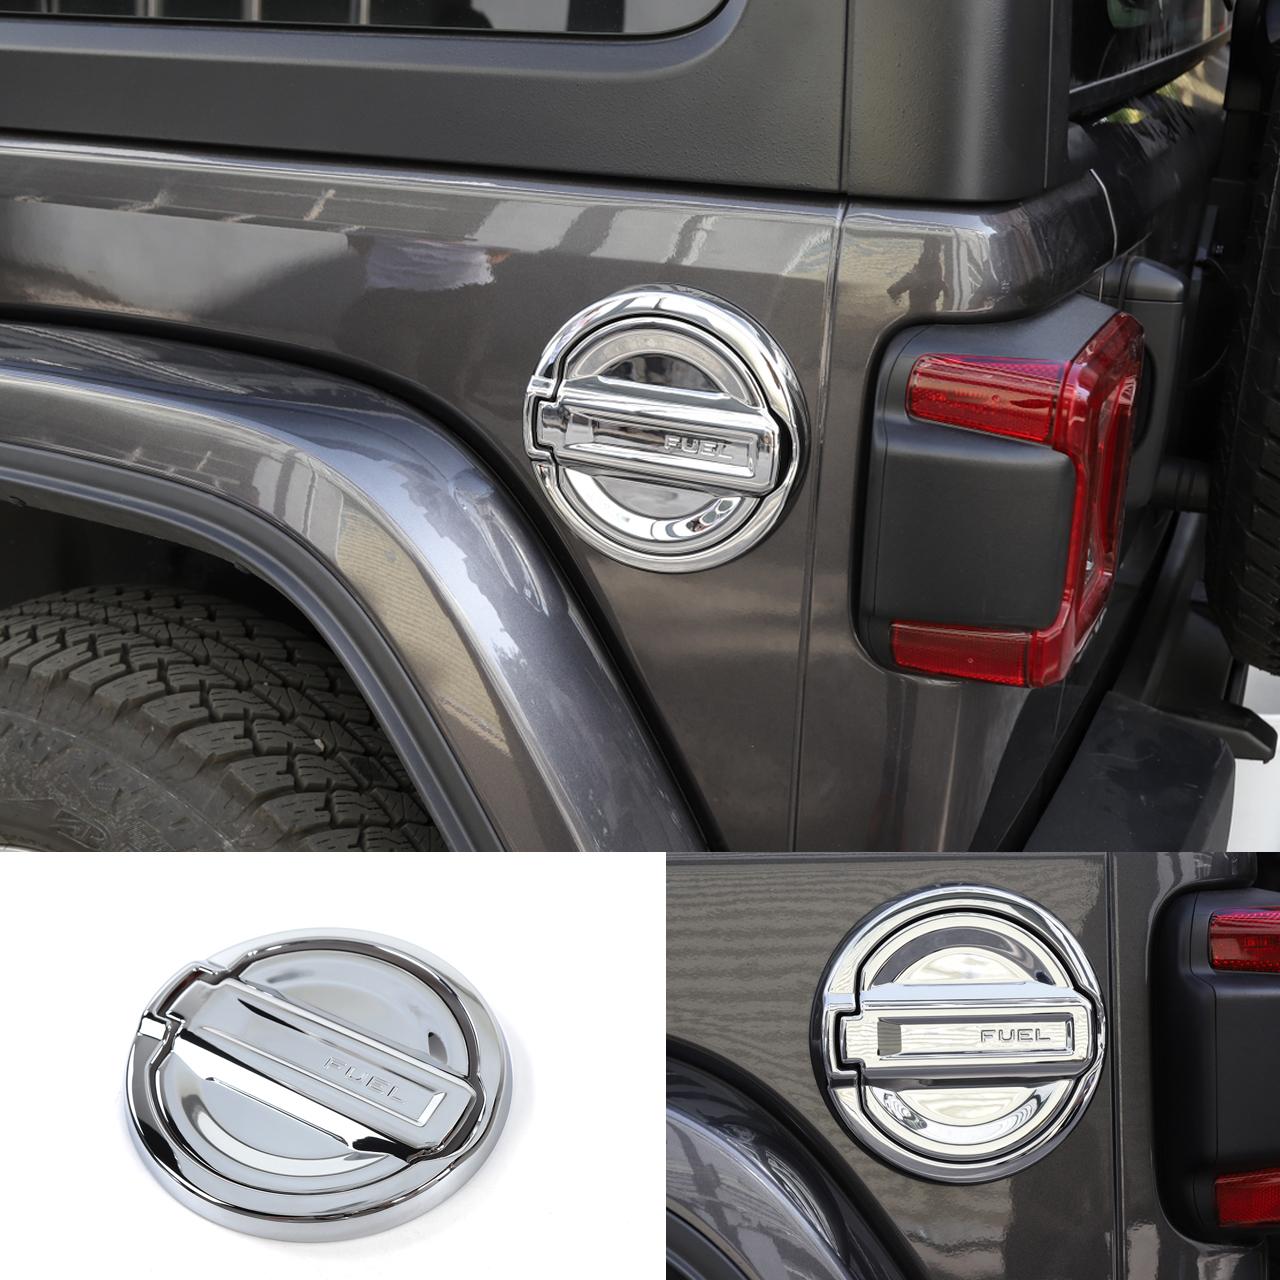 Chrome ABS Fuel Filler Oil Tank Gas Cap Lid Trim Cover for 2018 Jeep Wrangler JL